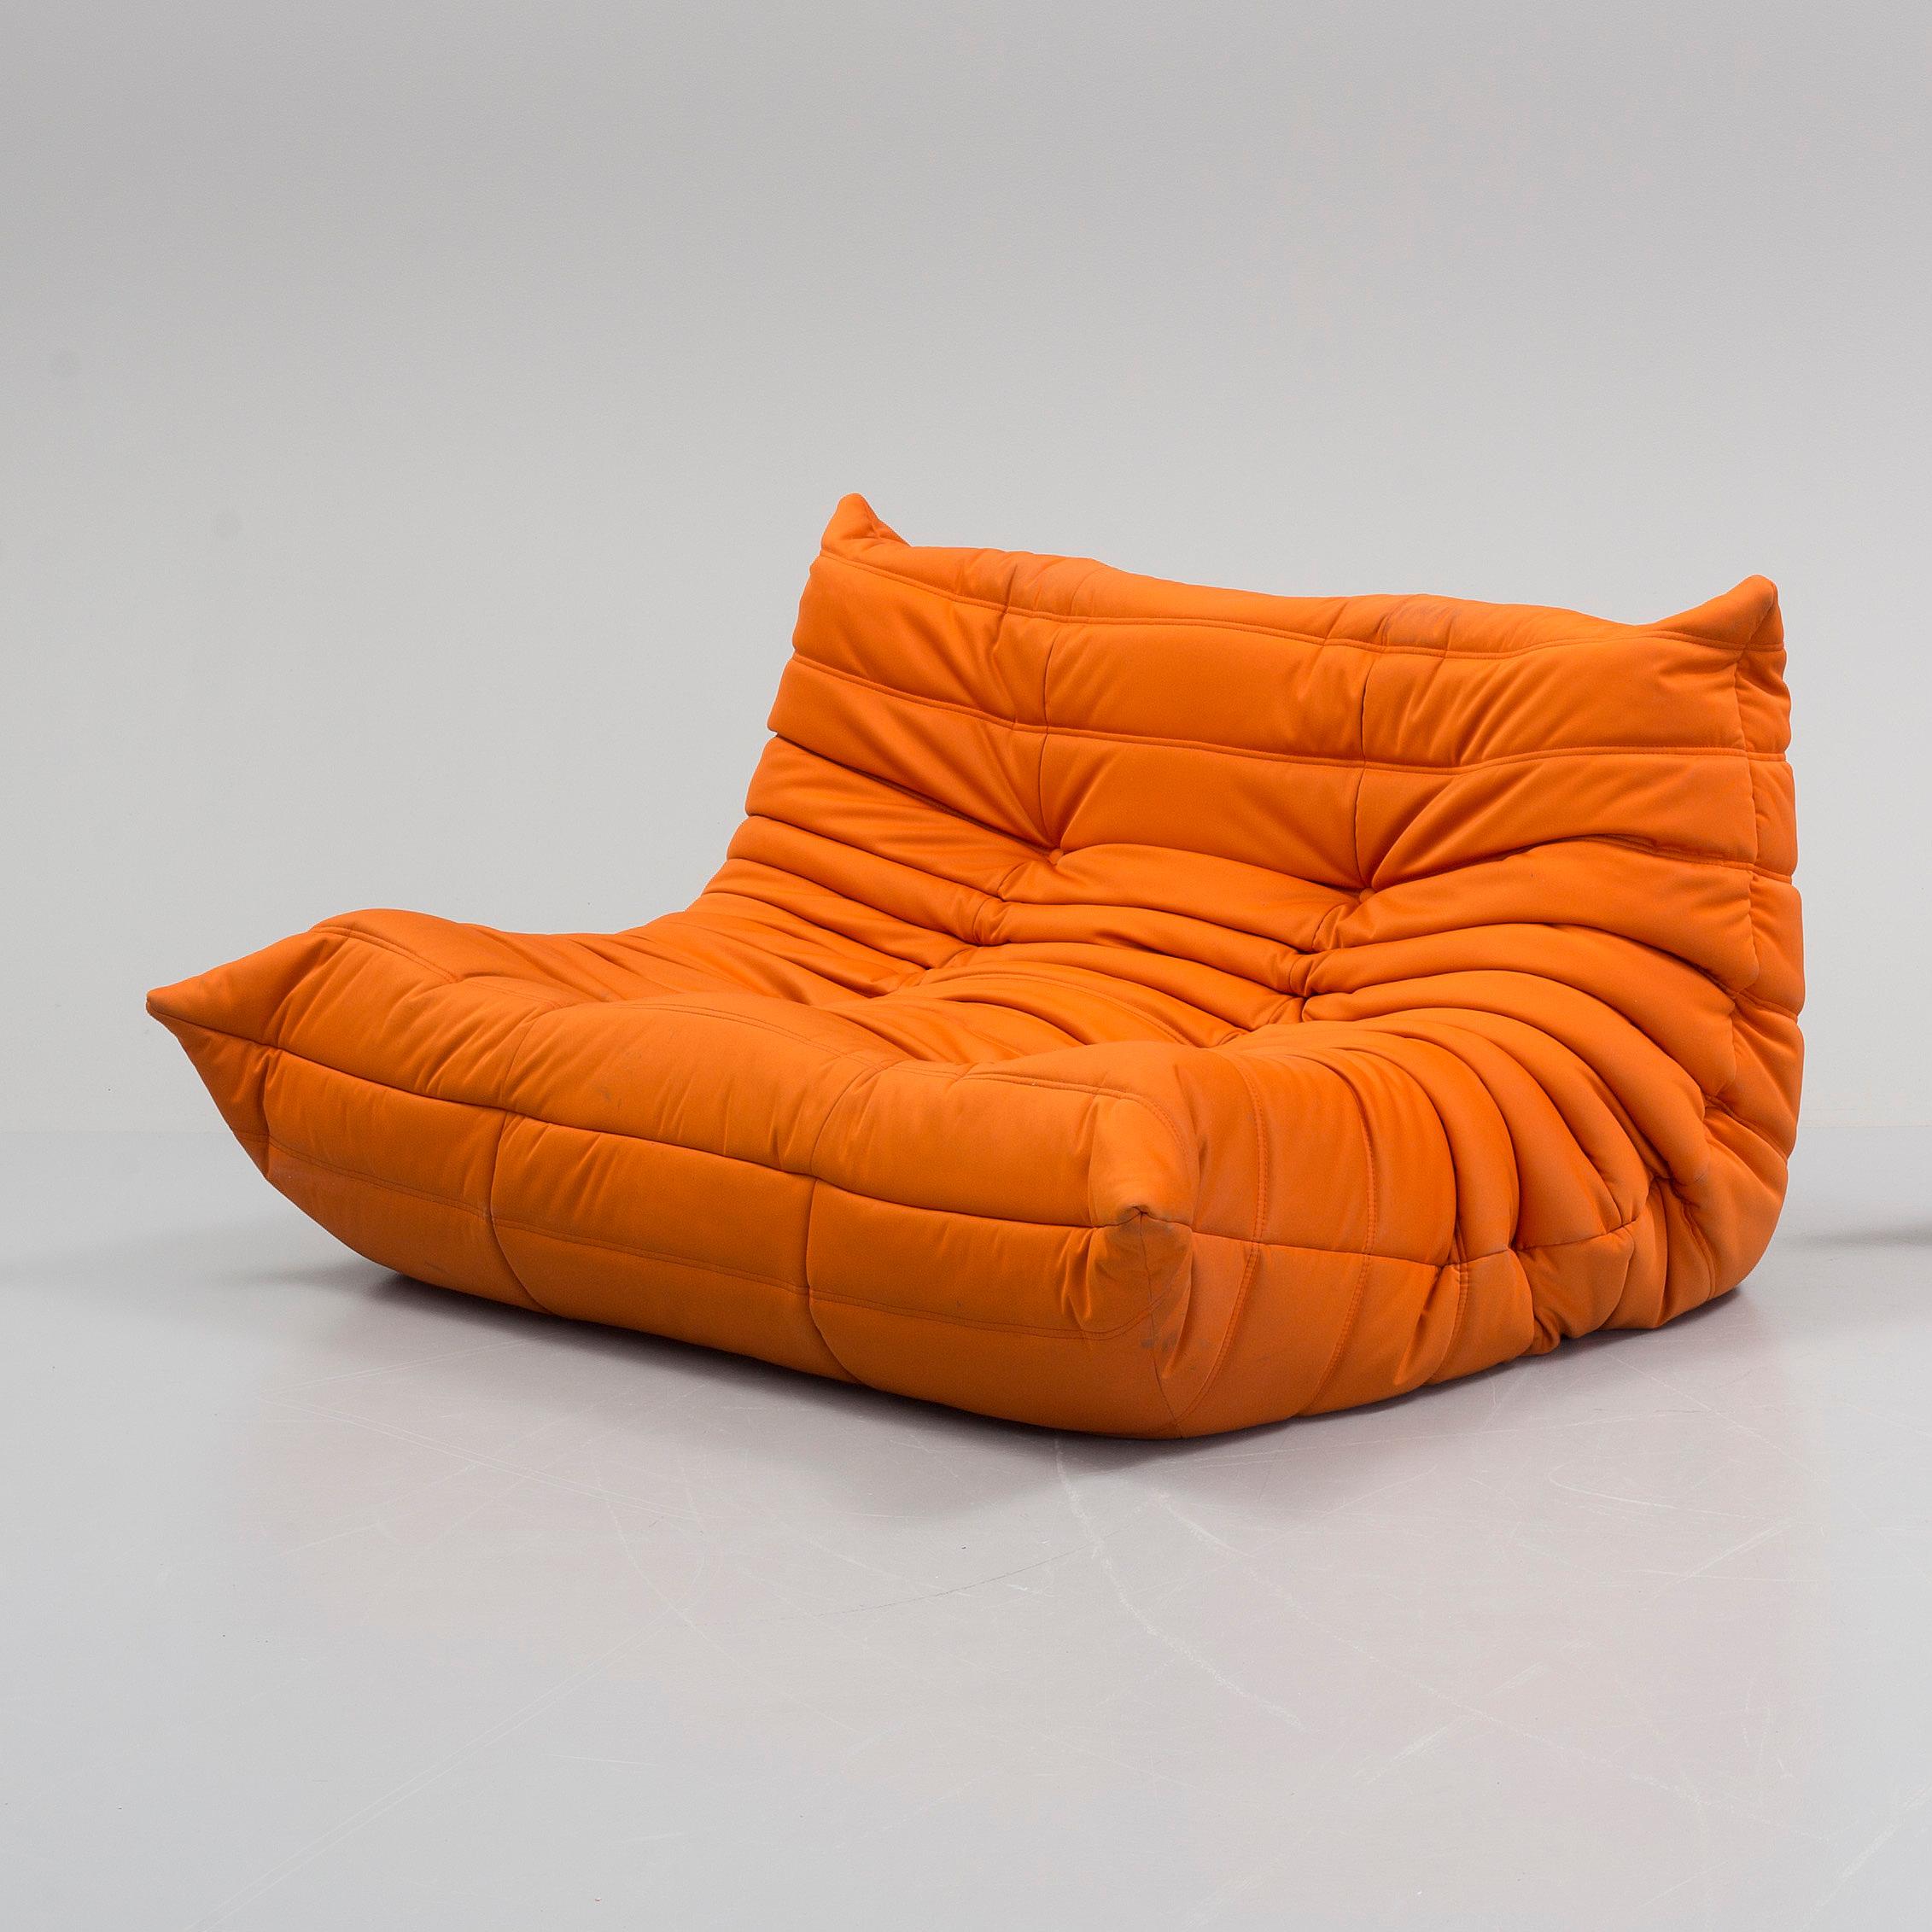 ligne roset togo sofa second hand refil sofa. Black Bedroom Furniture Sets. Home Design Ideas